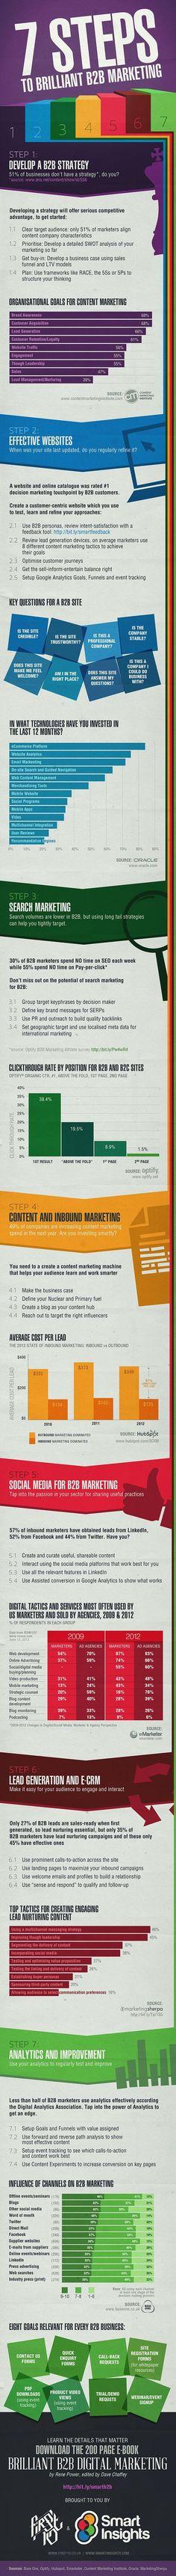 #likingmarketing helps small business define and refine their marketing objectives - marketing B2B social-media-stra...